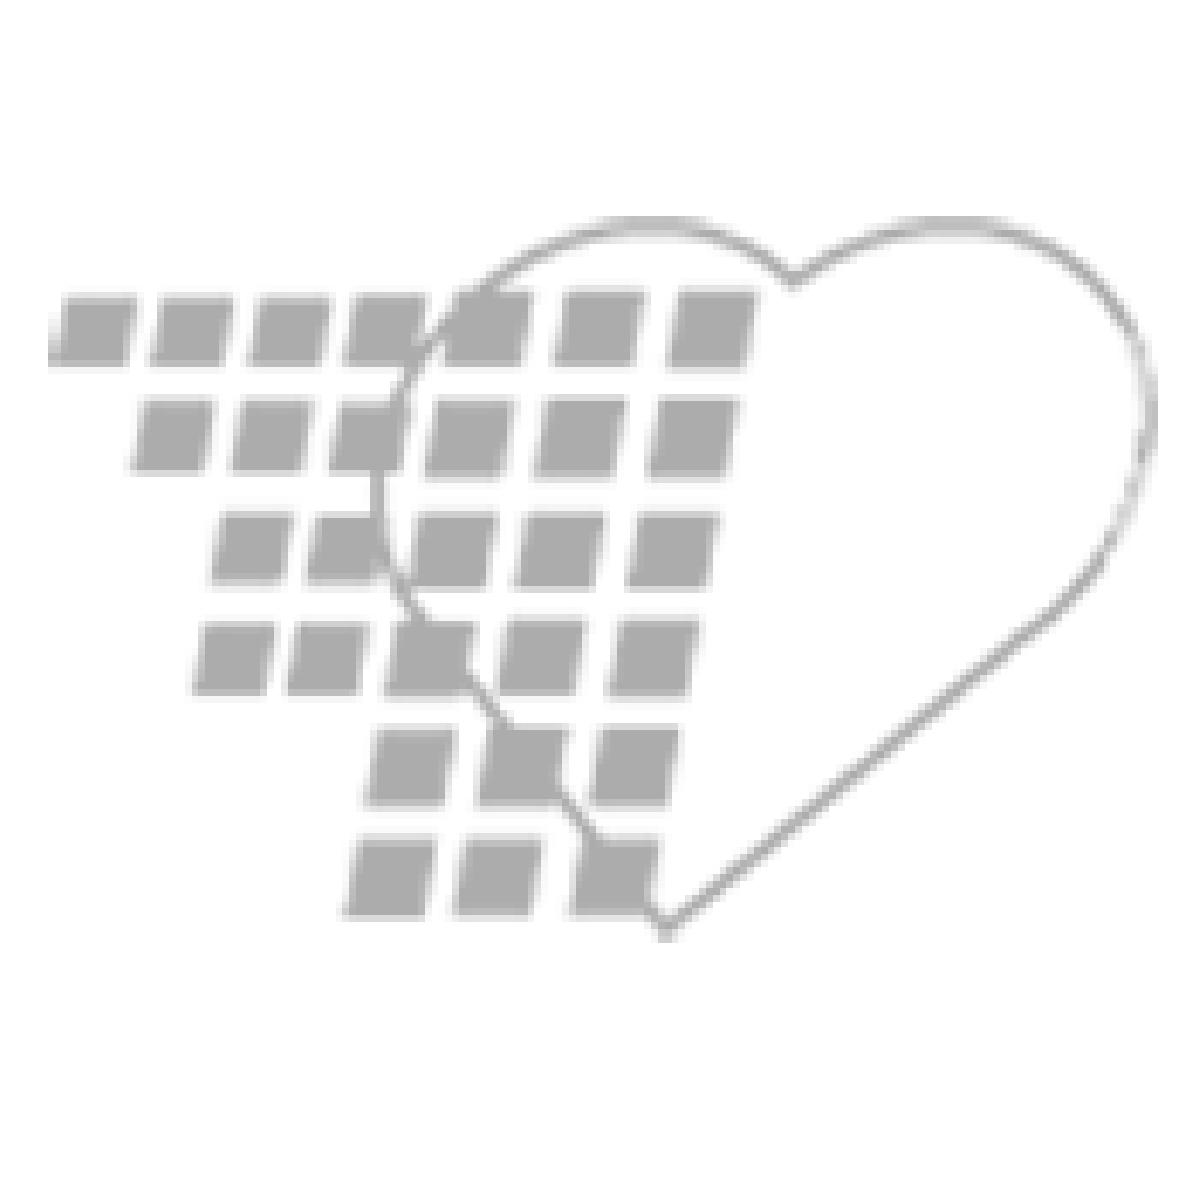 03-04-9651 PURELL™ Advanced Hand Sanitizer Gel 4oz Flip Cap Bottle - (ships ORMD)